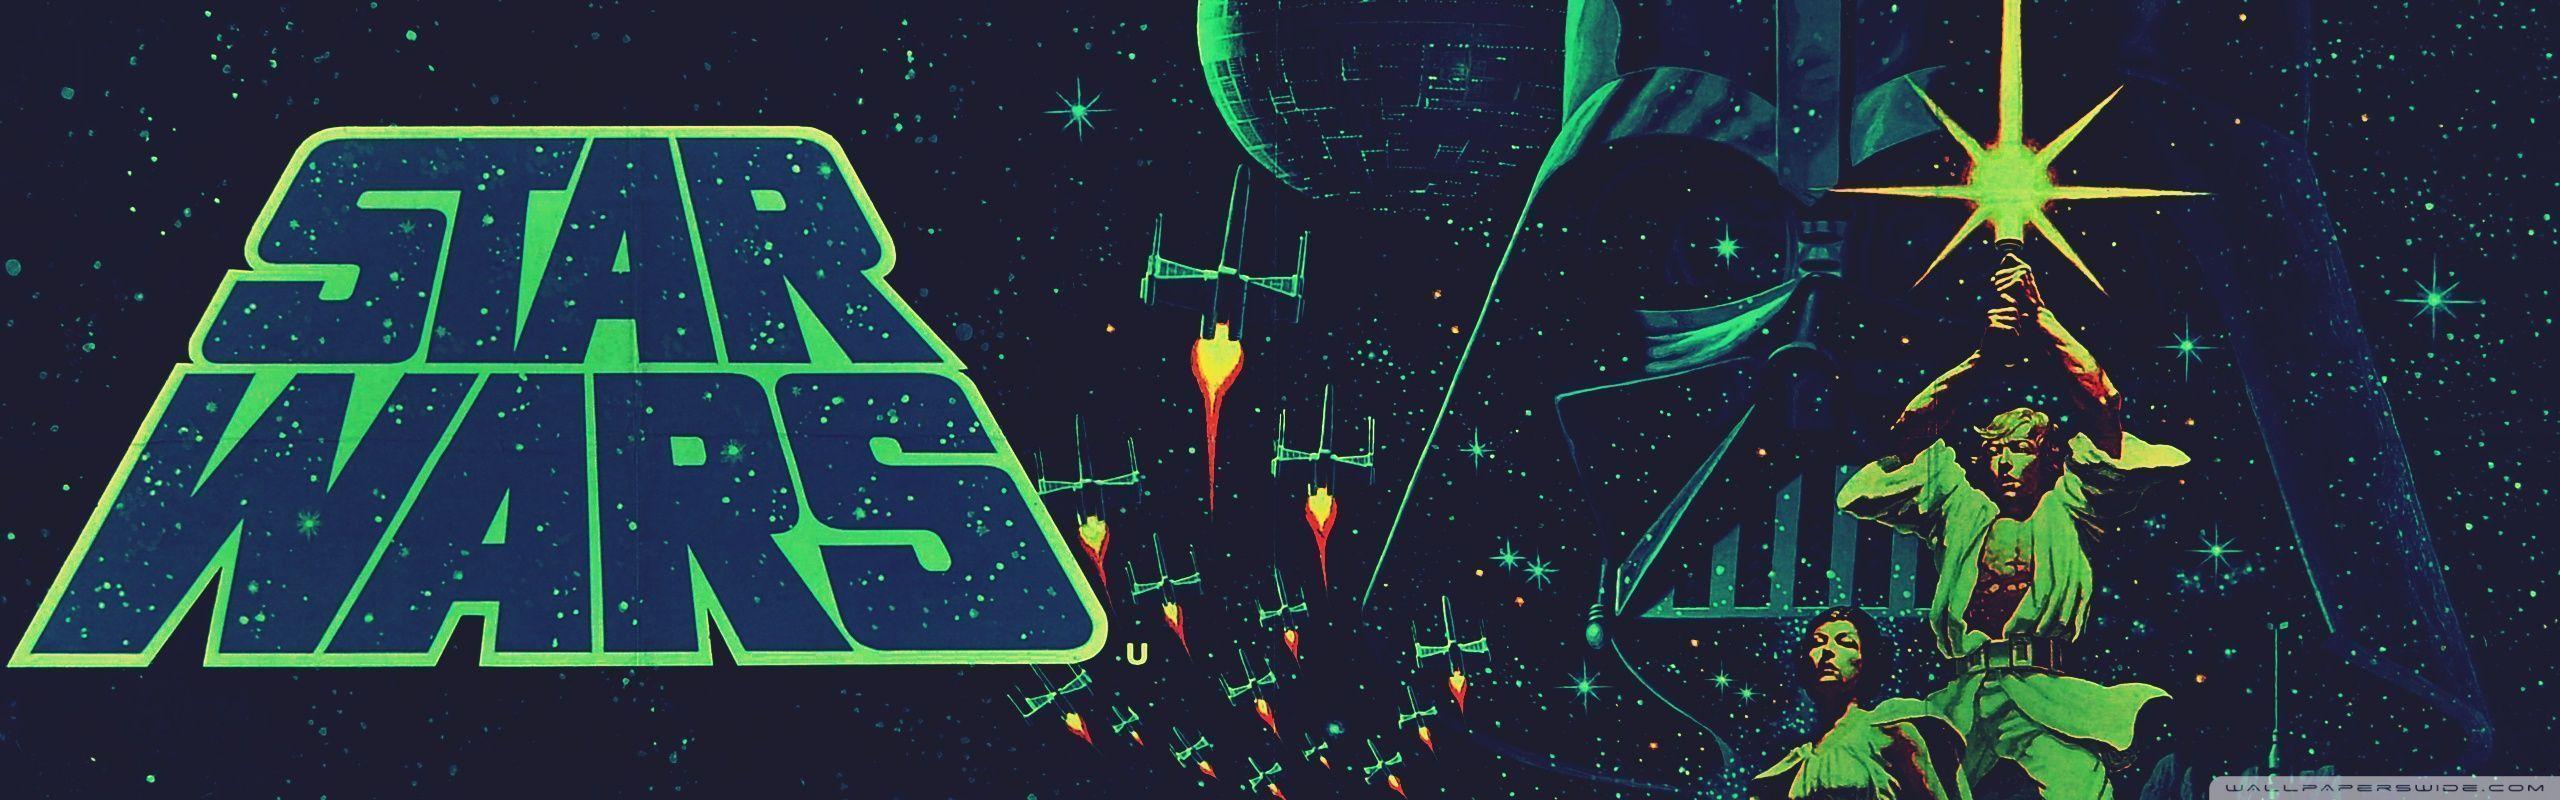 Dual Screen Star Wars Wallpapers Top Free Dual Screen Star Wars Backgrounds Wallpaperaccess